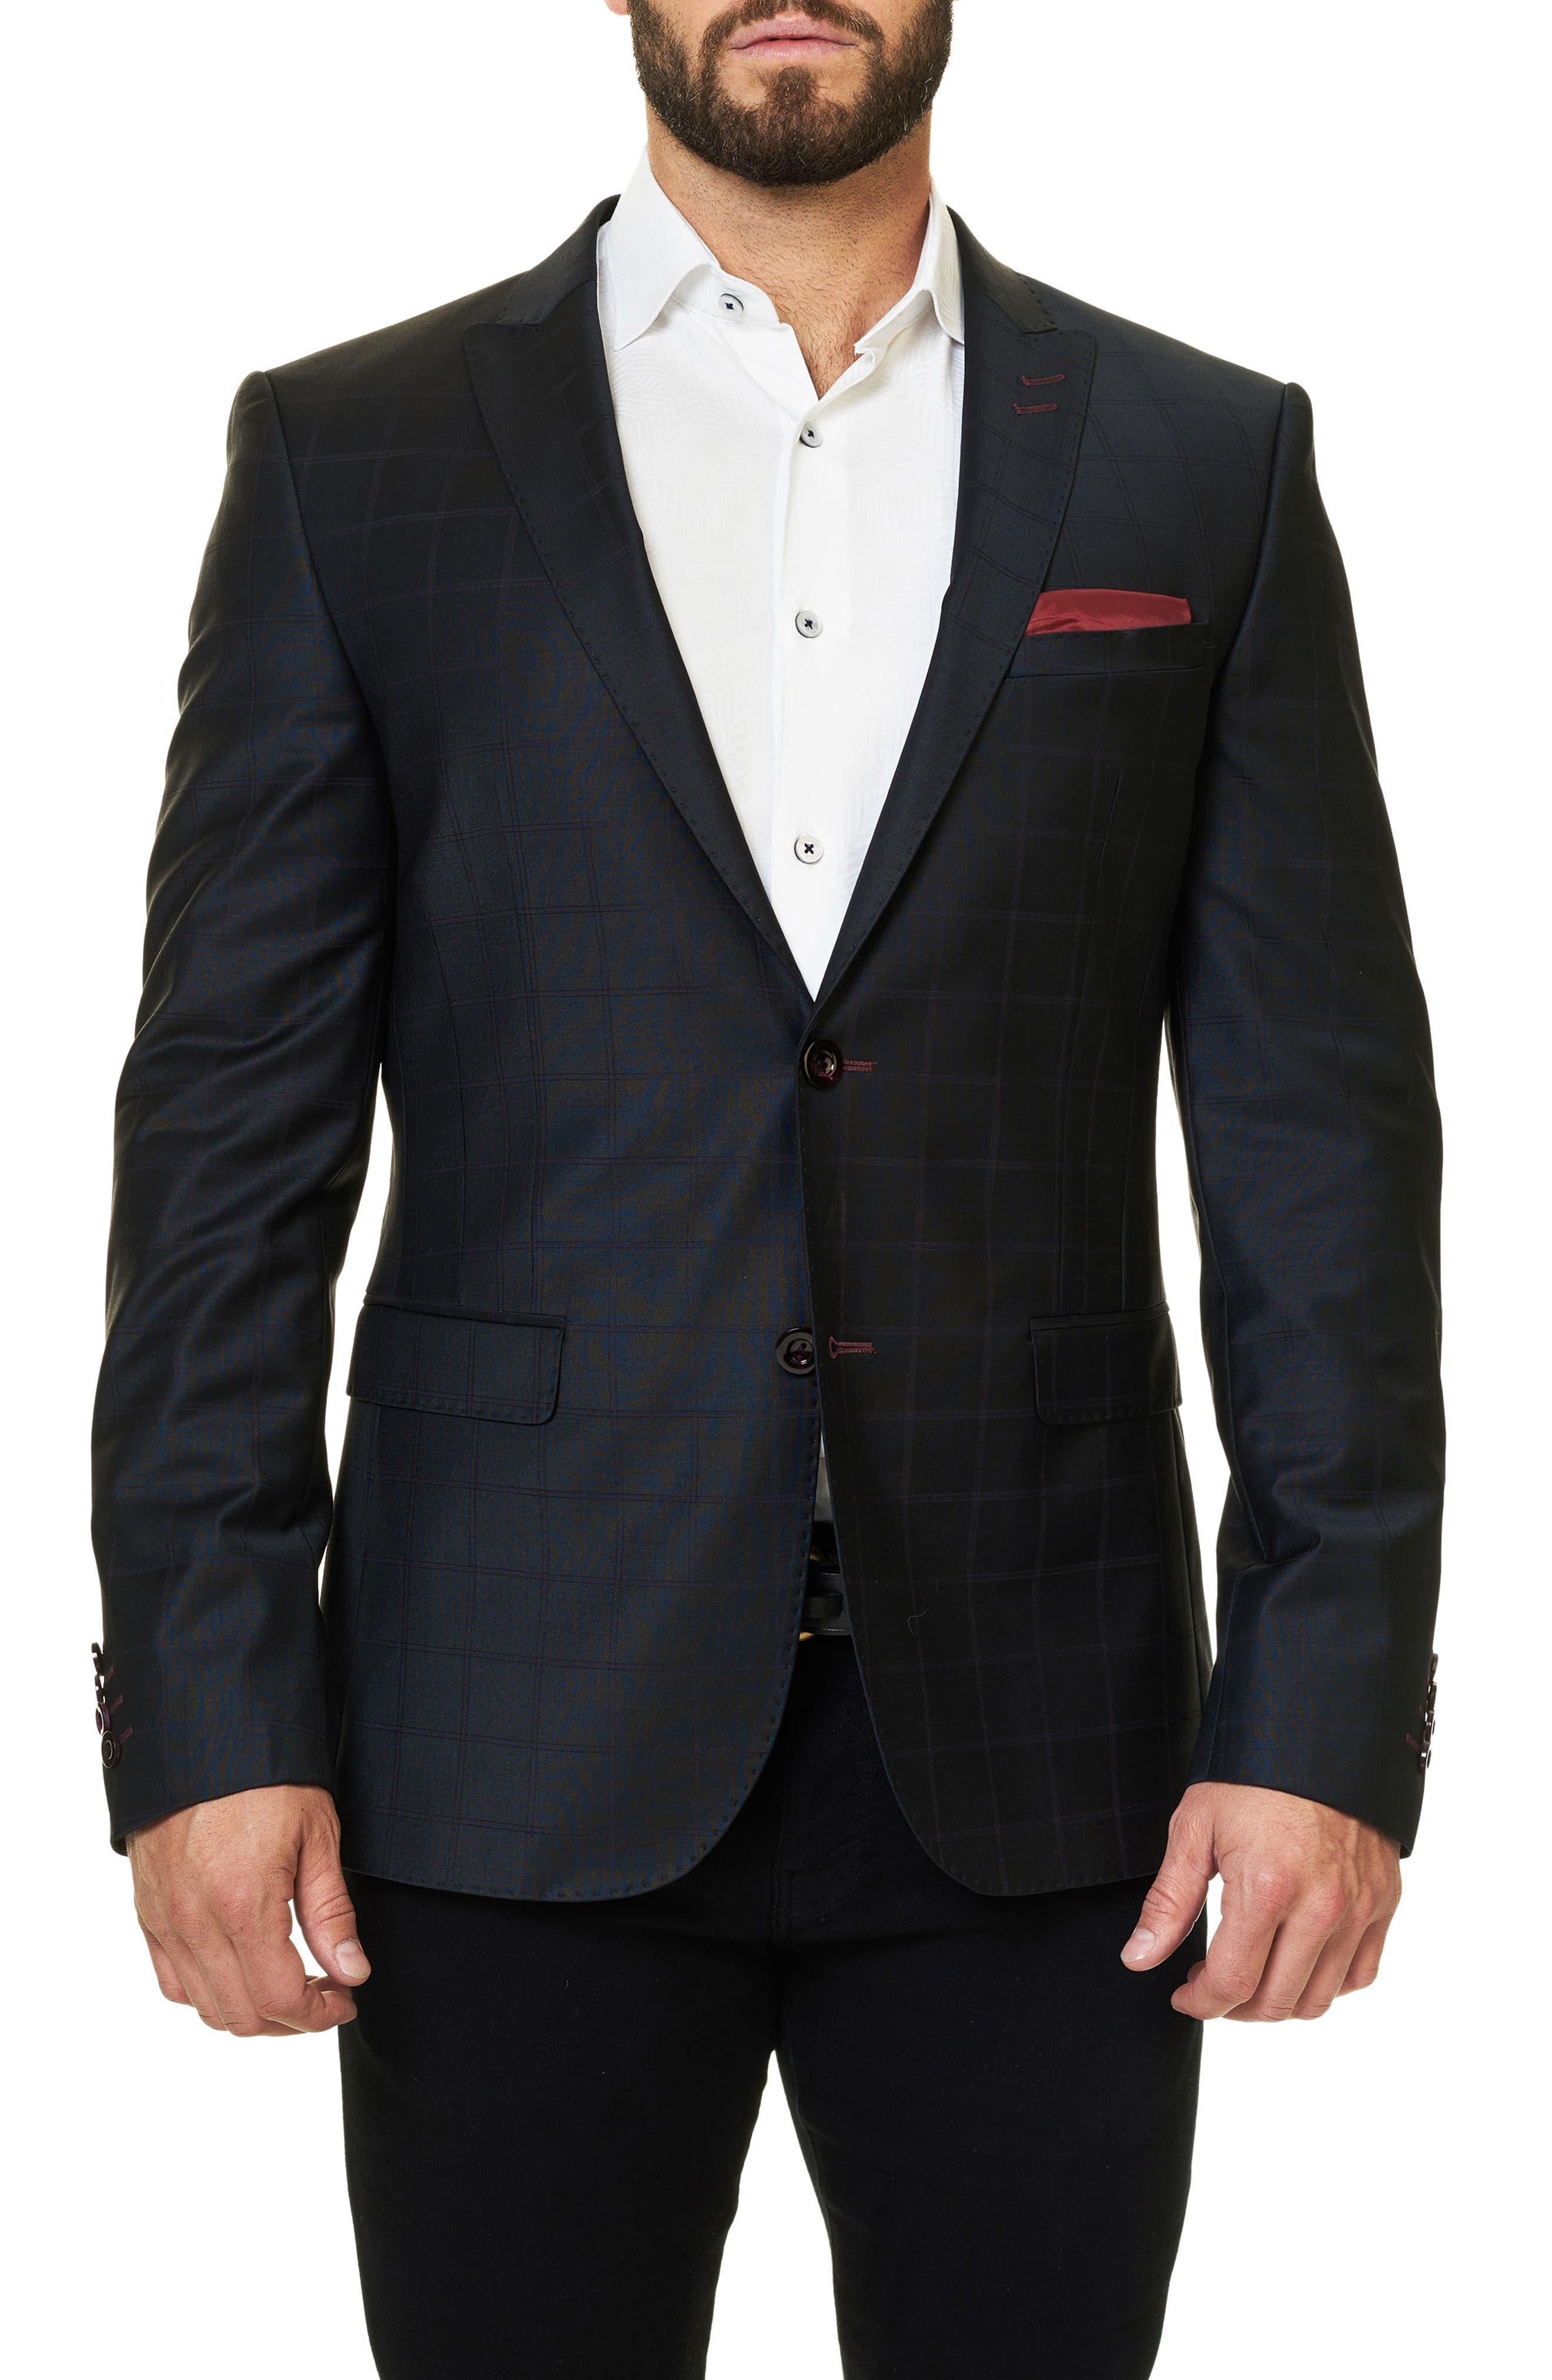 Maceoo Descarte Windowpane Sport Coat